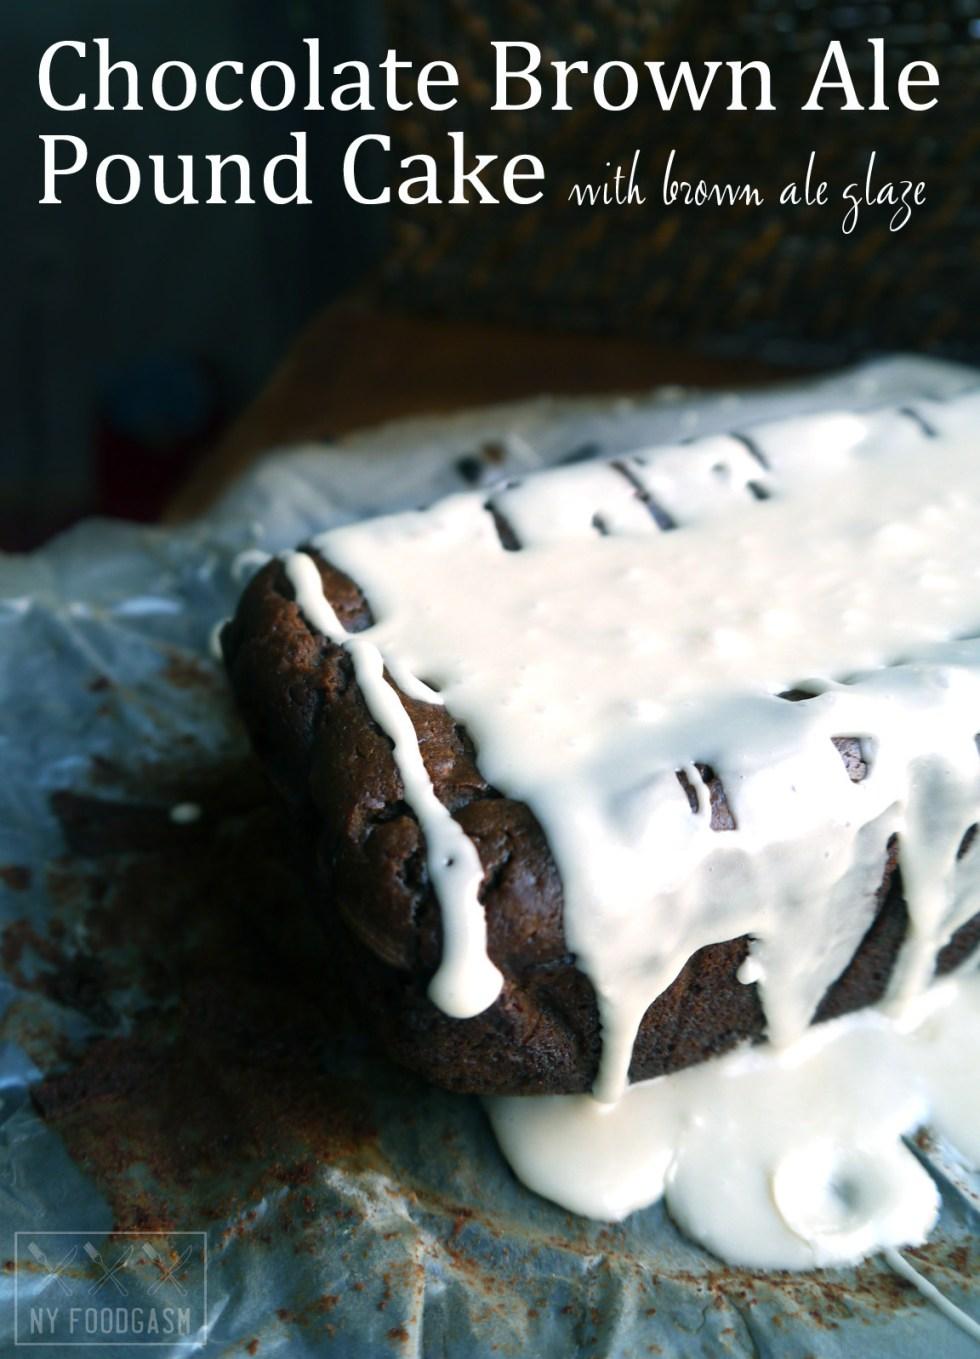 ChocolateBrownAleCake-cover (2)